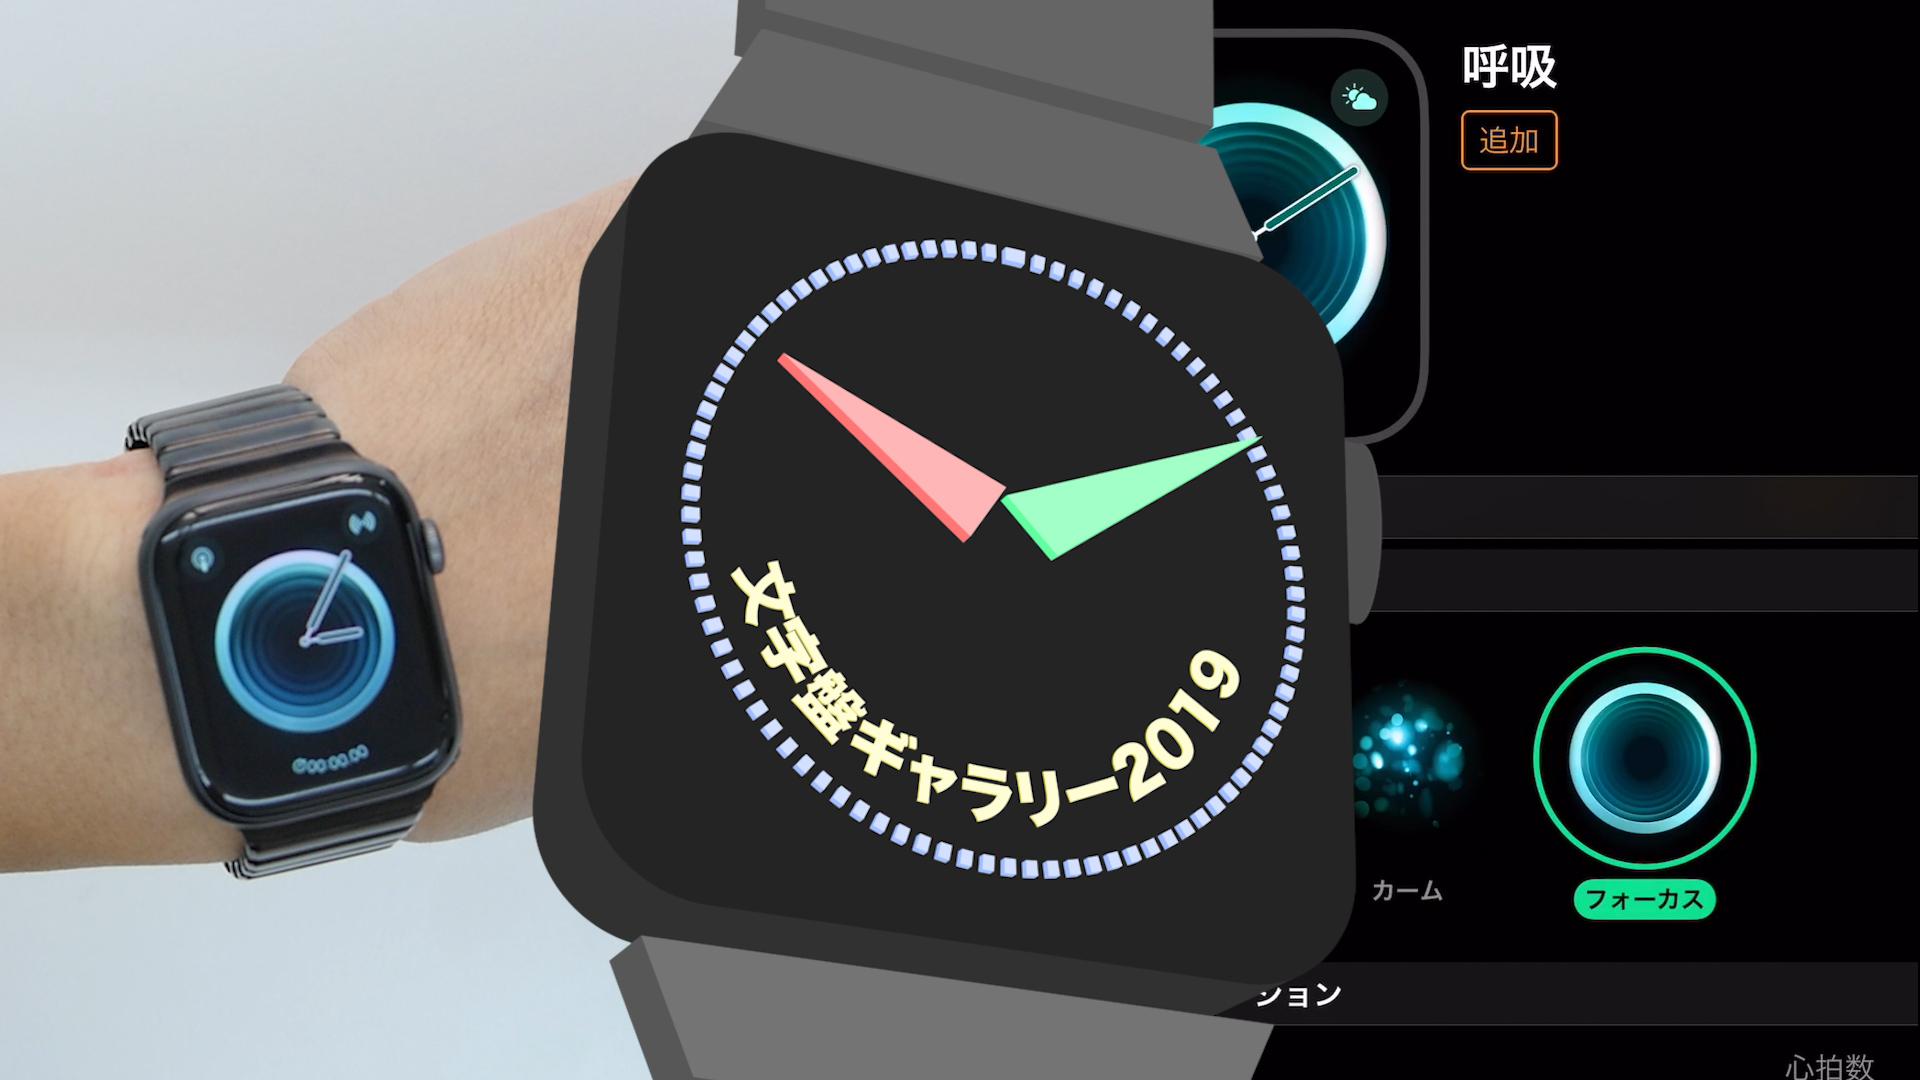 Apple Watch 4の文字盤ギャラリー全24種類を紹介 2019年決定版 オイゾウ